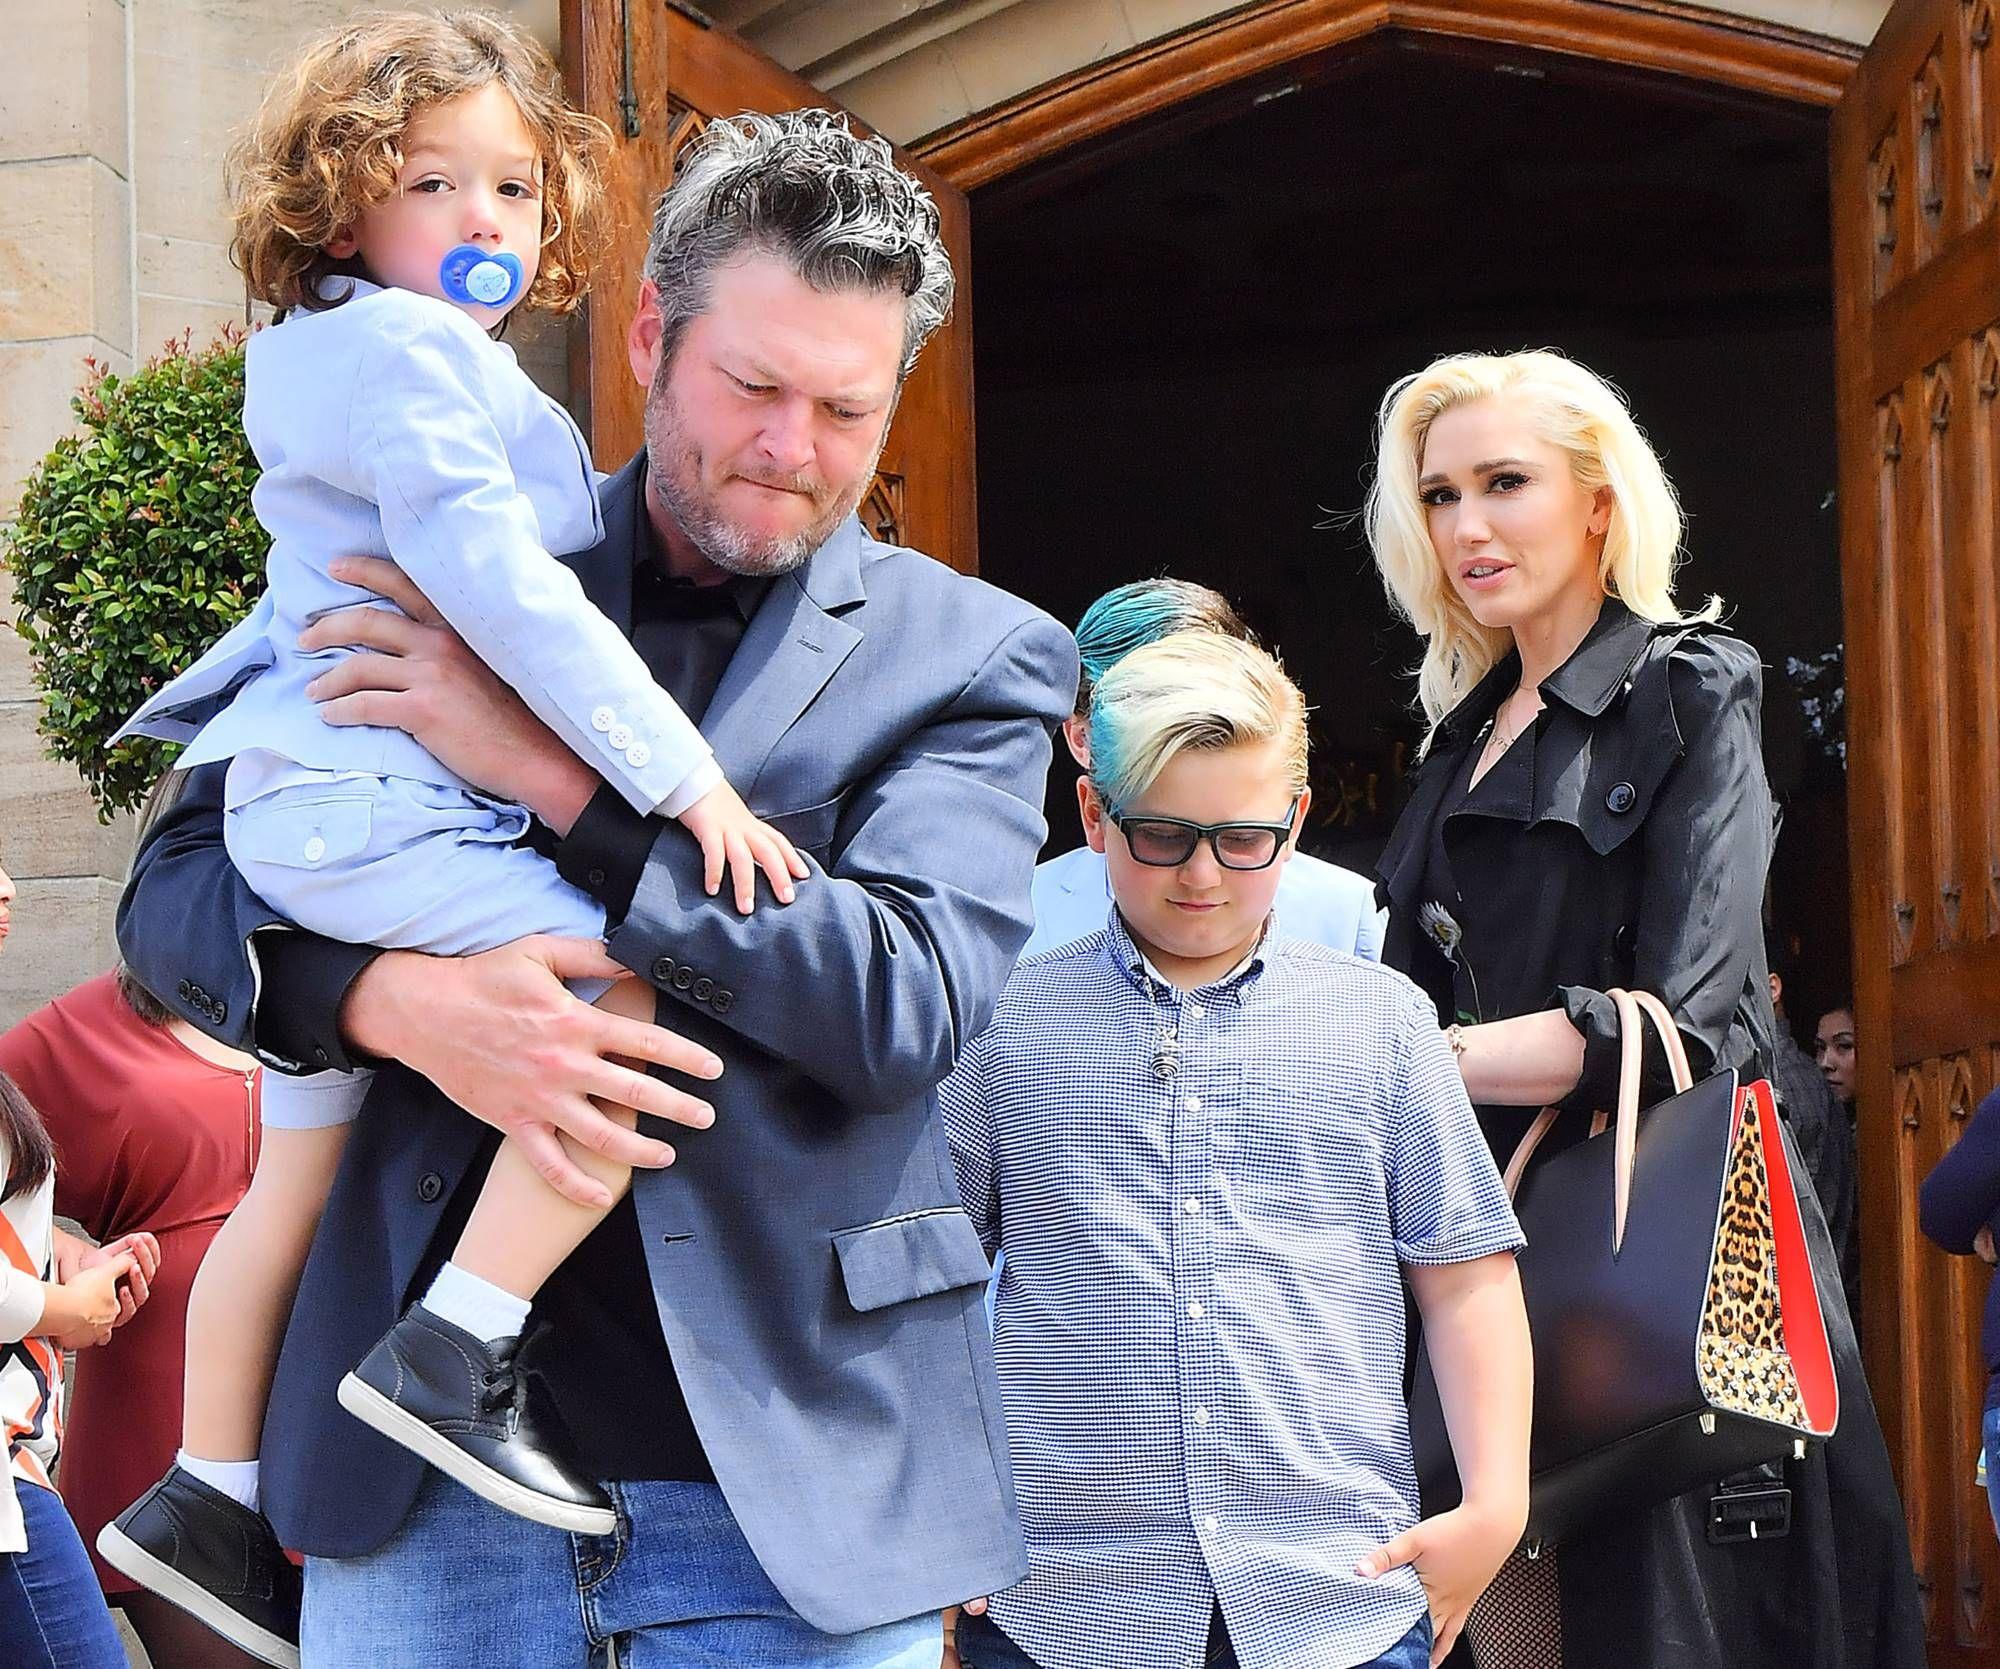 Blake Shelton And Gwen Stefani Wedding Pictures.Blake Shelton Is Planning To Go All In With Gwen Stefani S Wedding